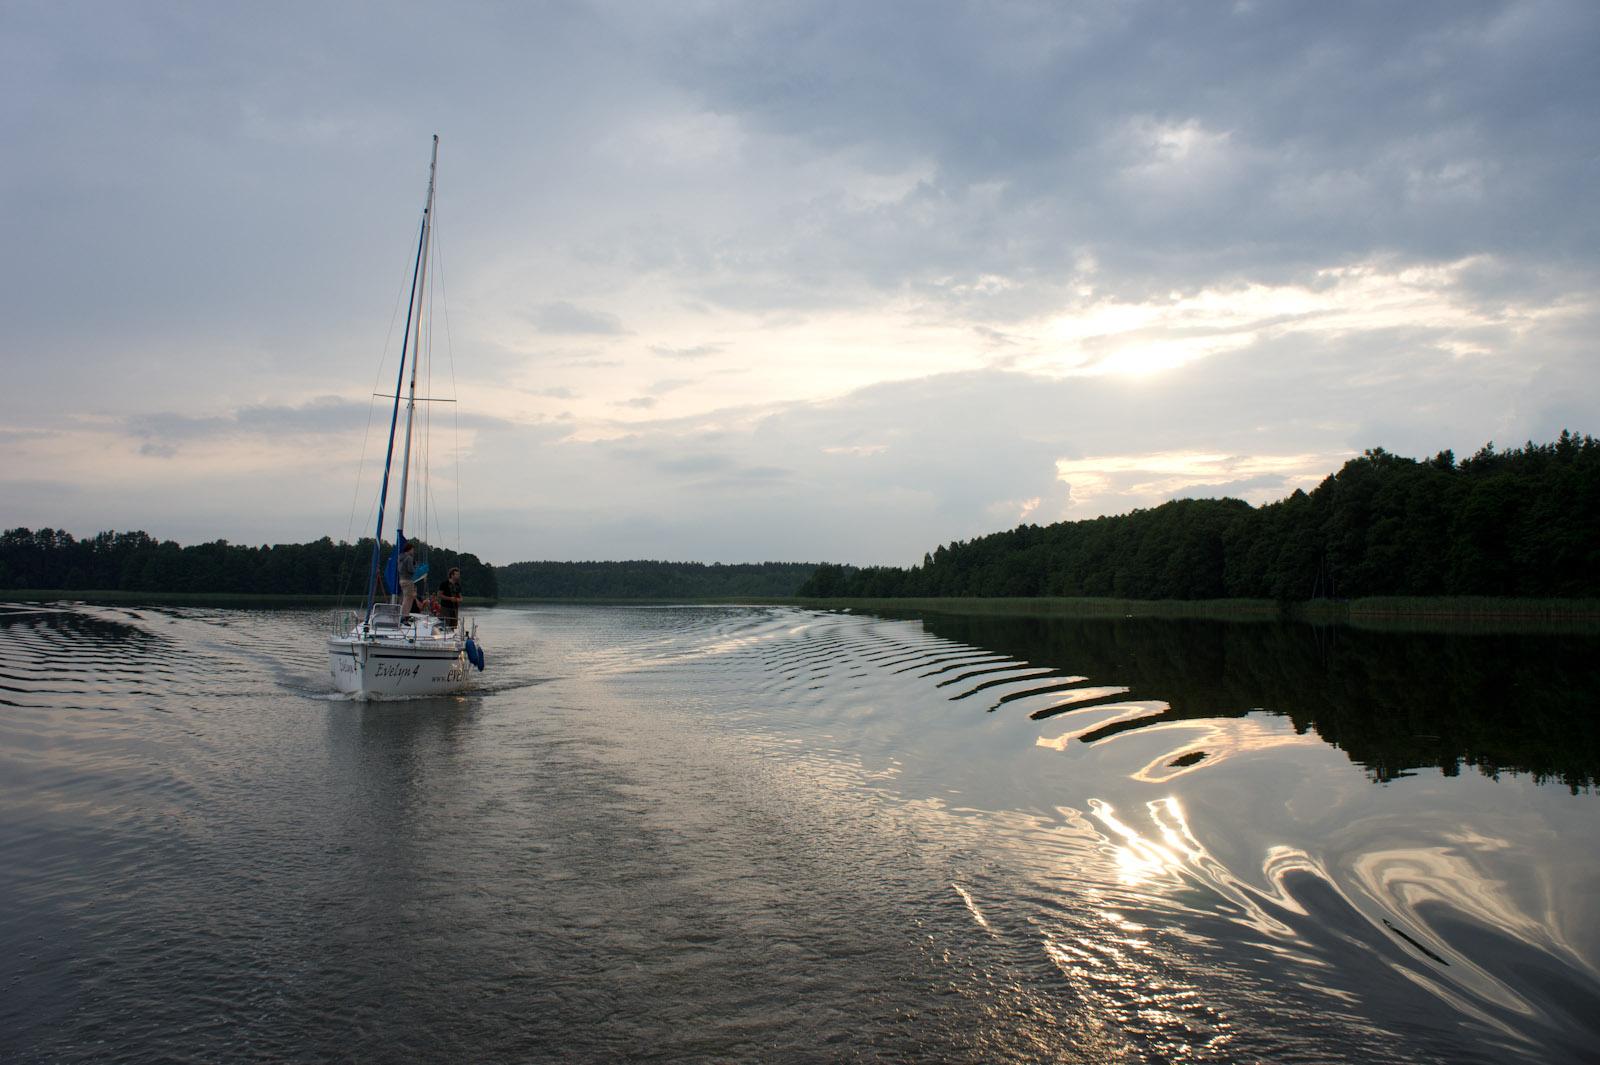 Kaczerajno bay, Mazuria, Poland